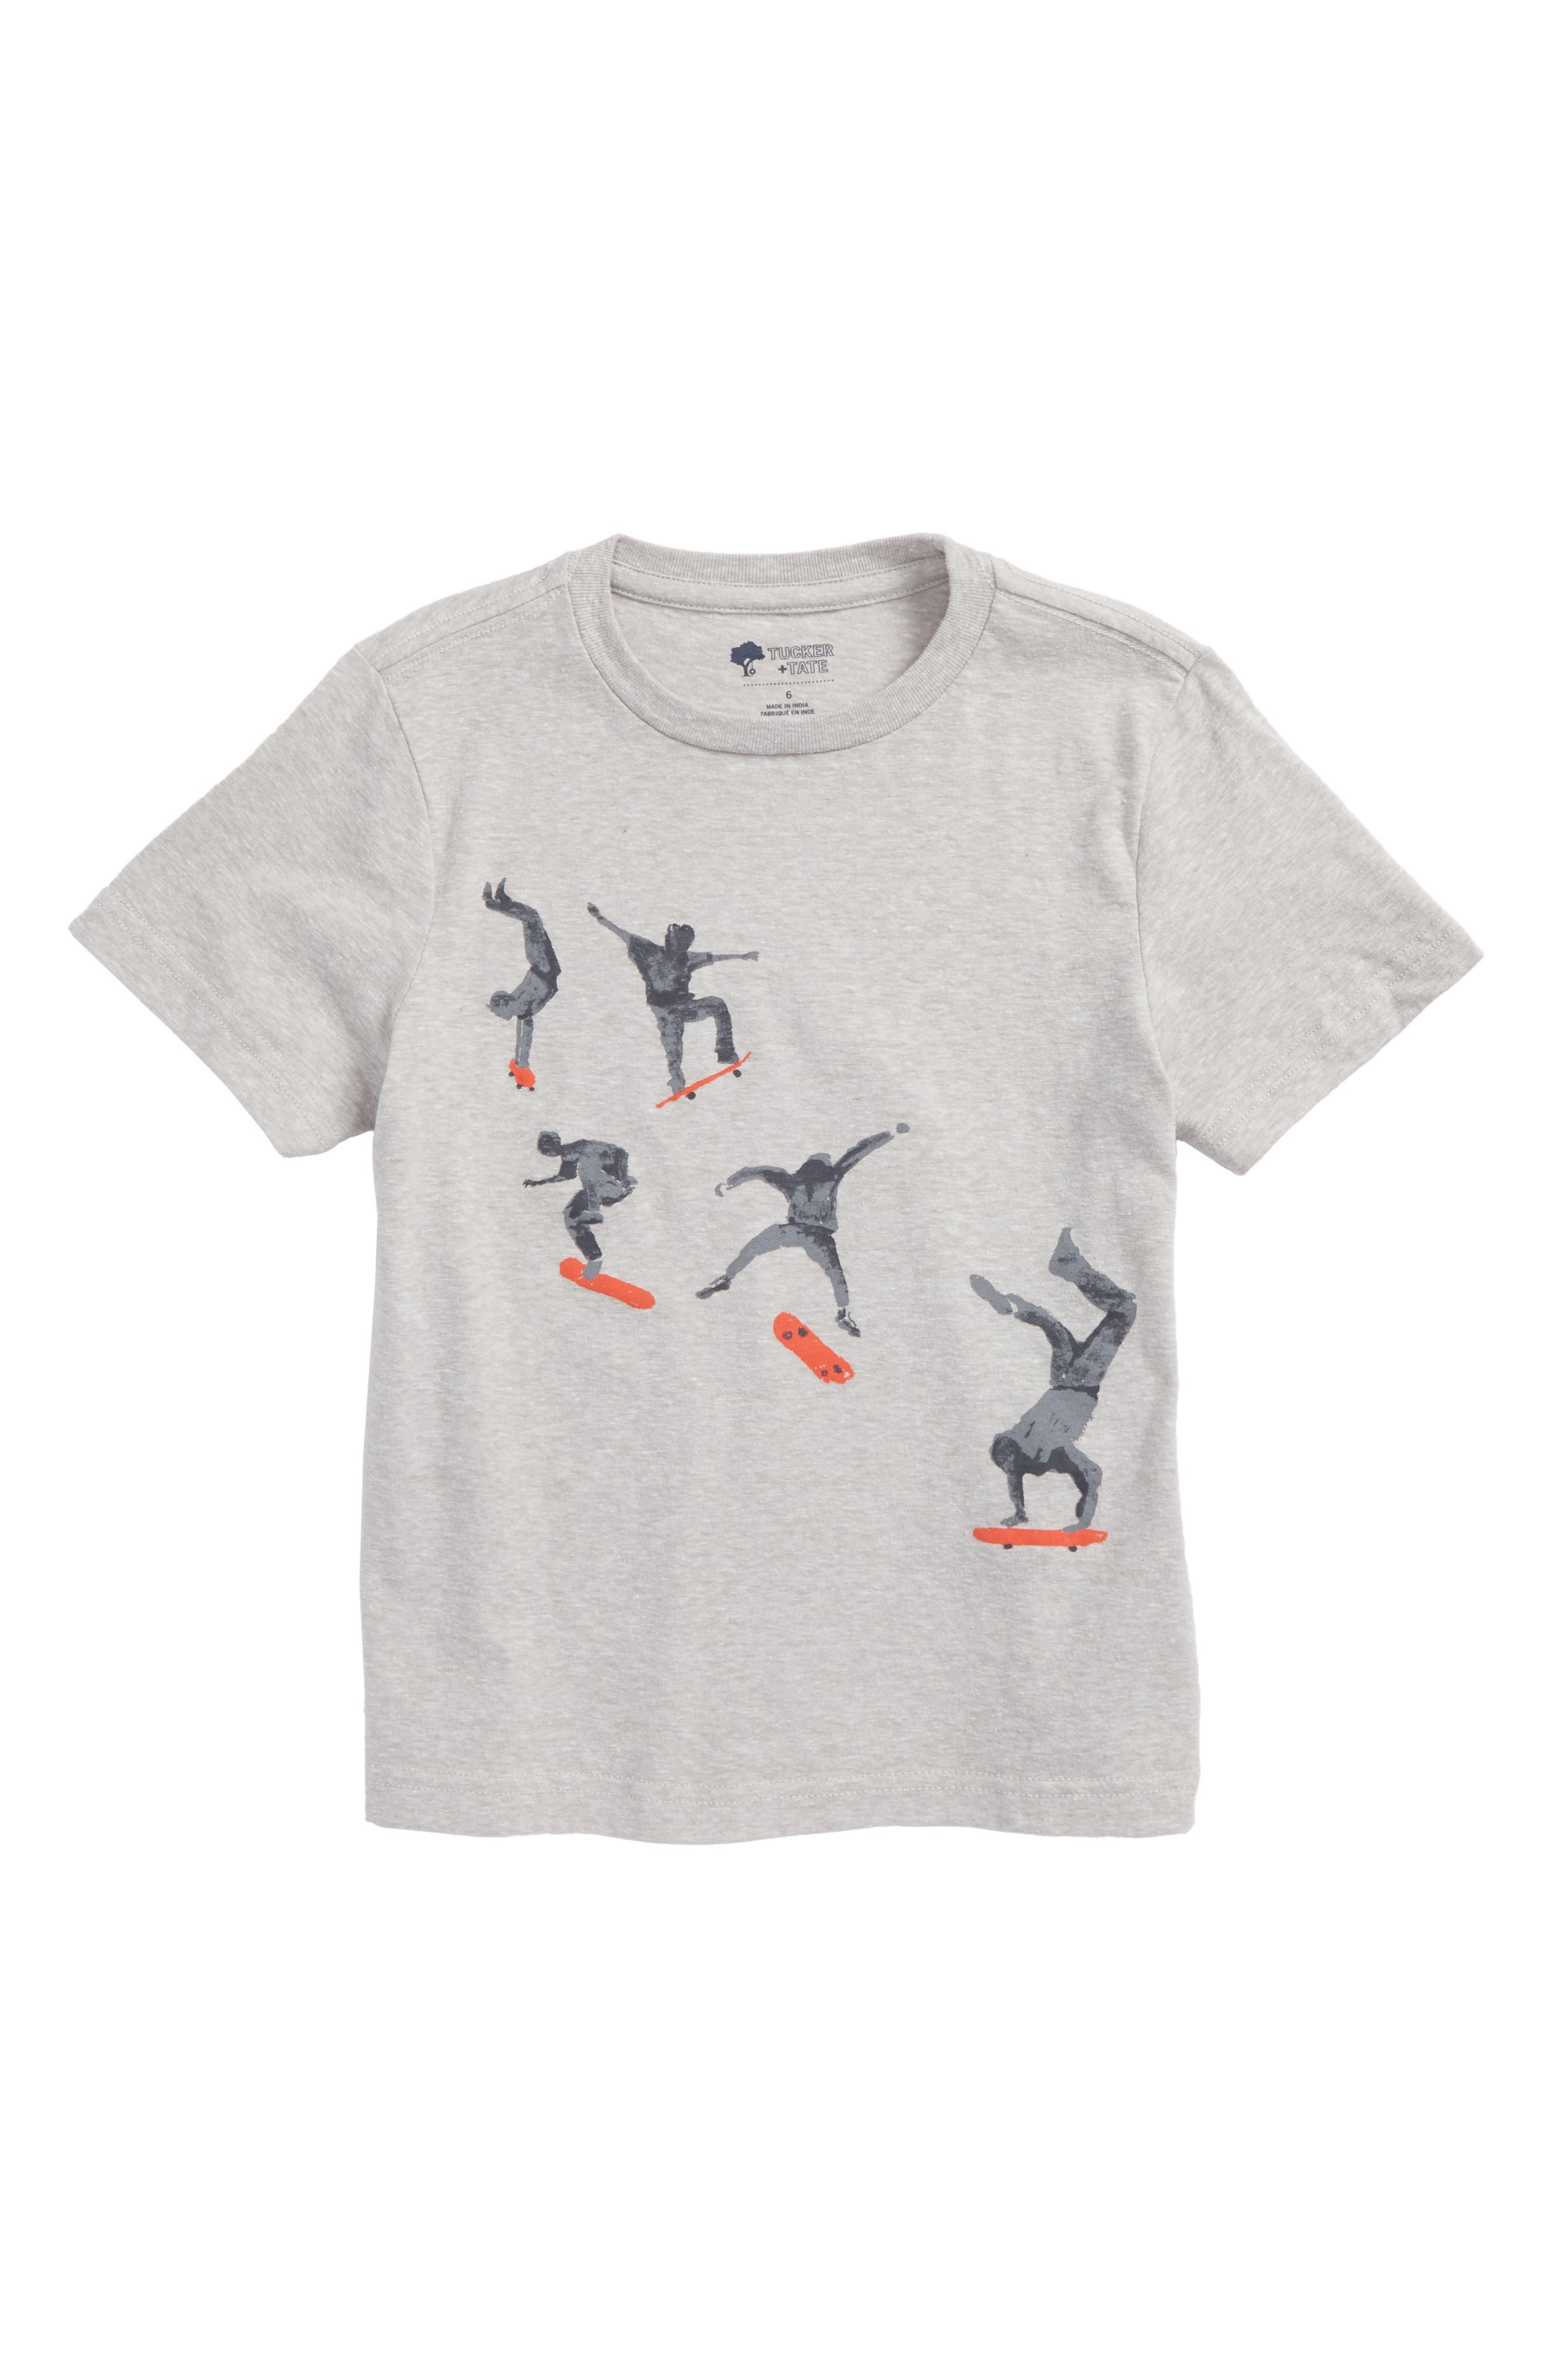 Graphic T-Shirt,                             Main thumbnail 1, color,                             Grey Ash Heather Skater